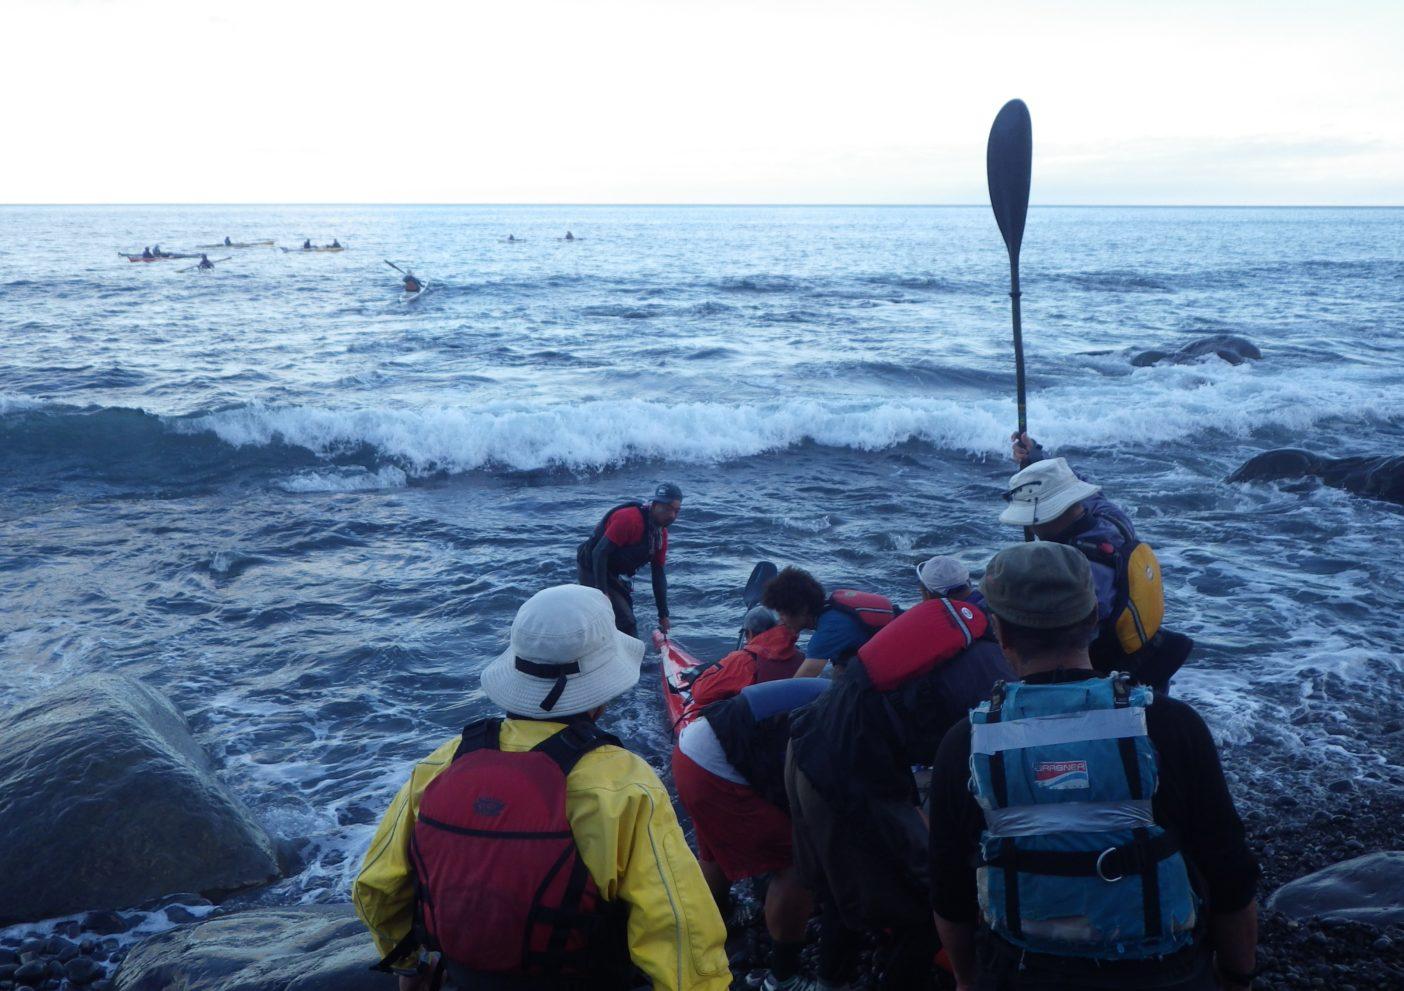 波間を狙い出艇。写真:島田和彦